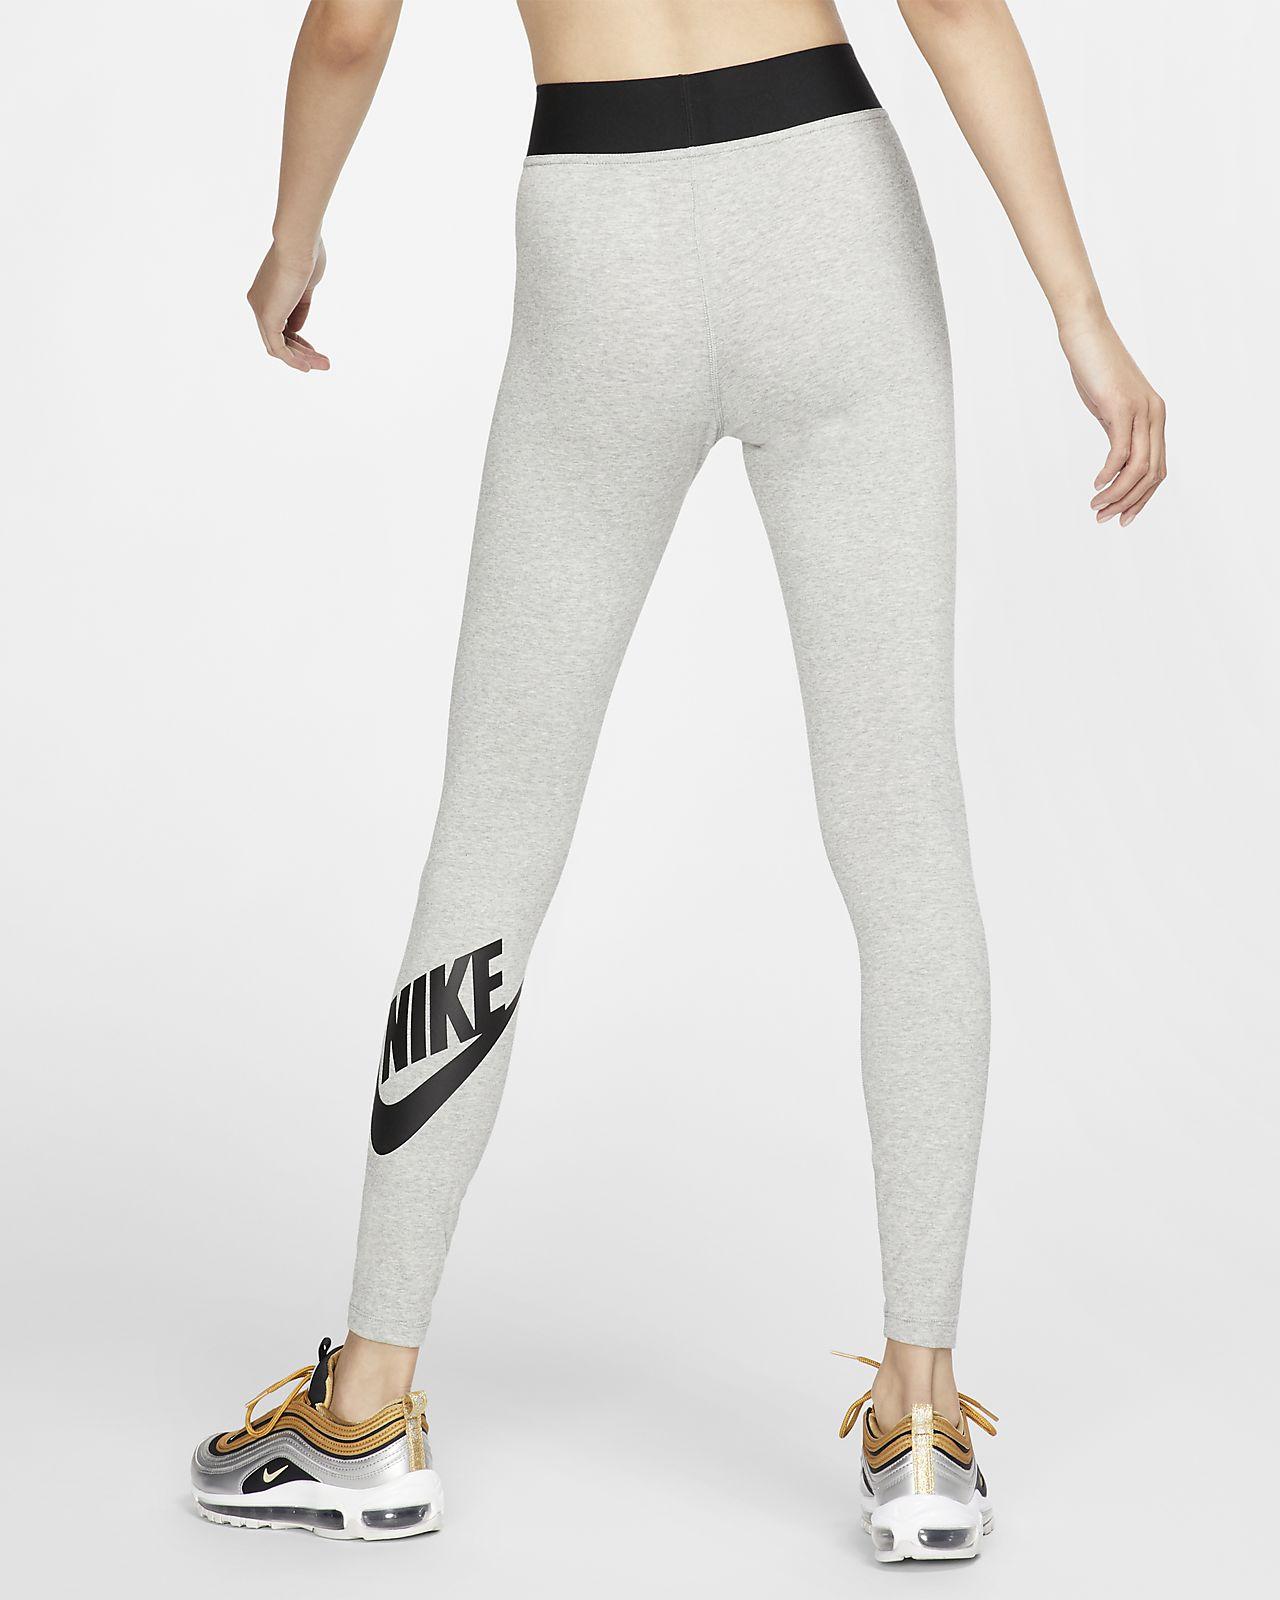 dccb0c88a2676 Nike Sportswear Leg-A-See Women's High-Waisted Leggings. Nike.com IN